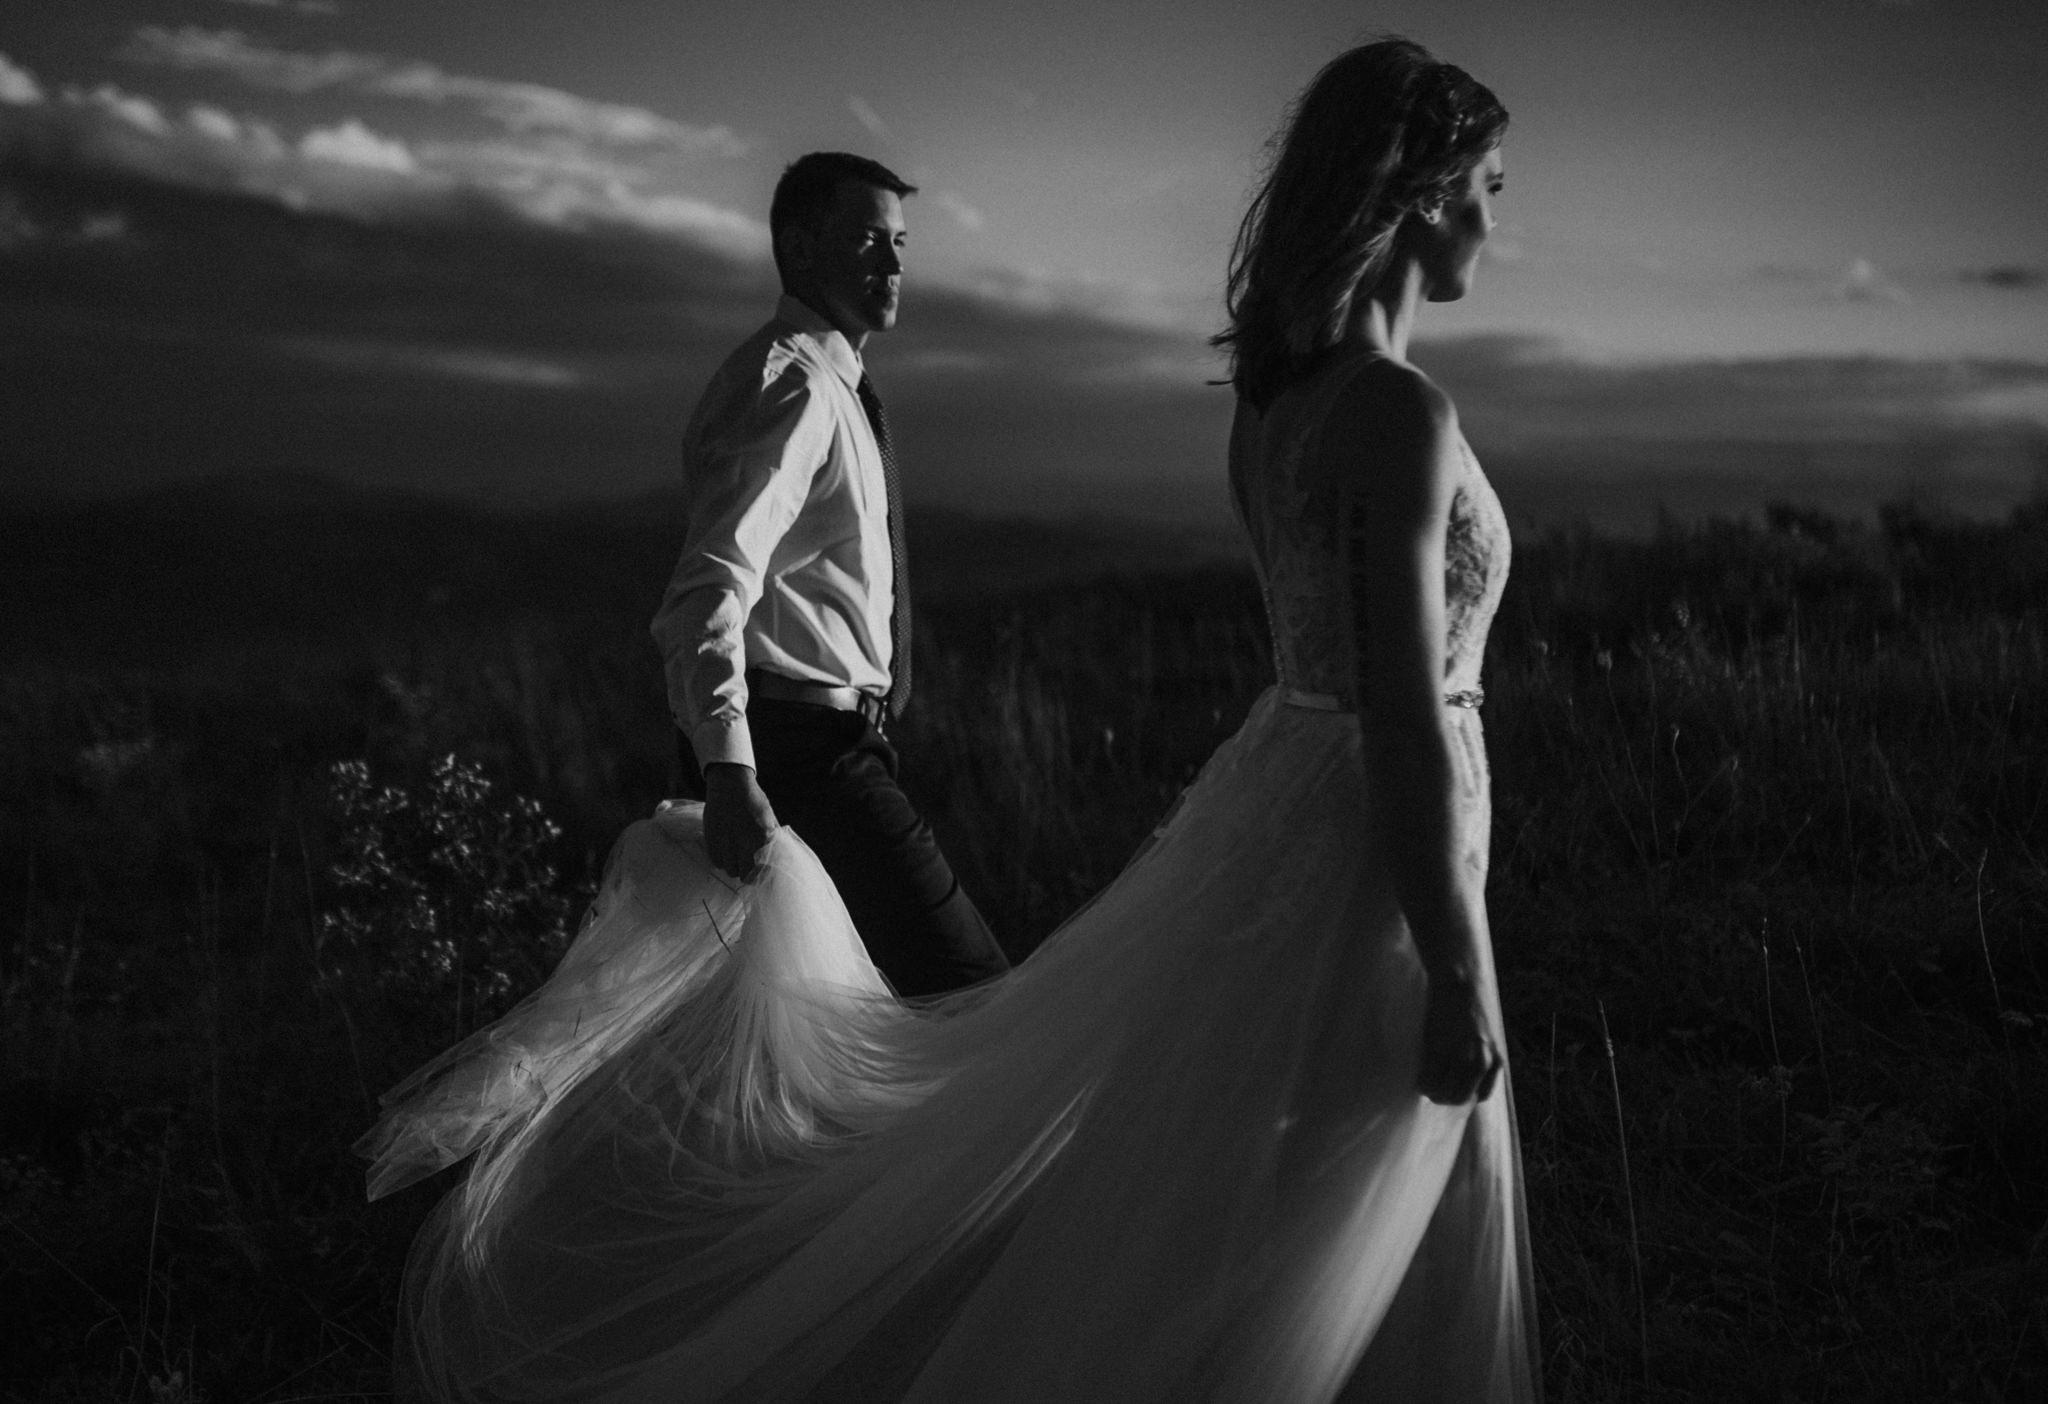 twyla jones photography | www.twylajones.com |  wedding vow renewal asheville north carolina max patch-33.jpg